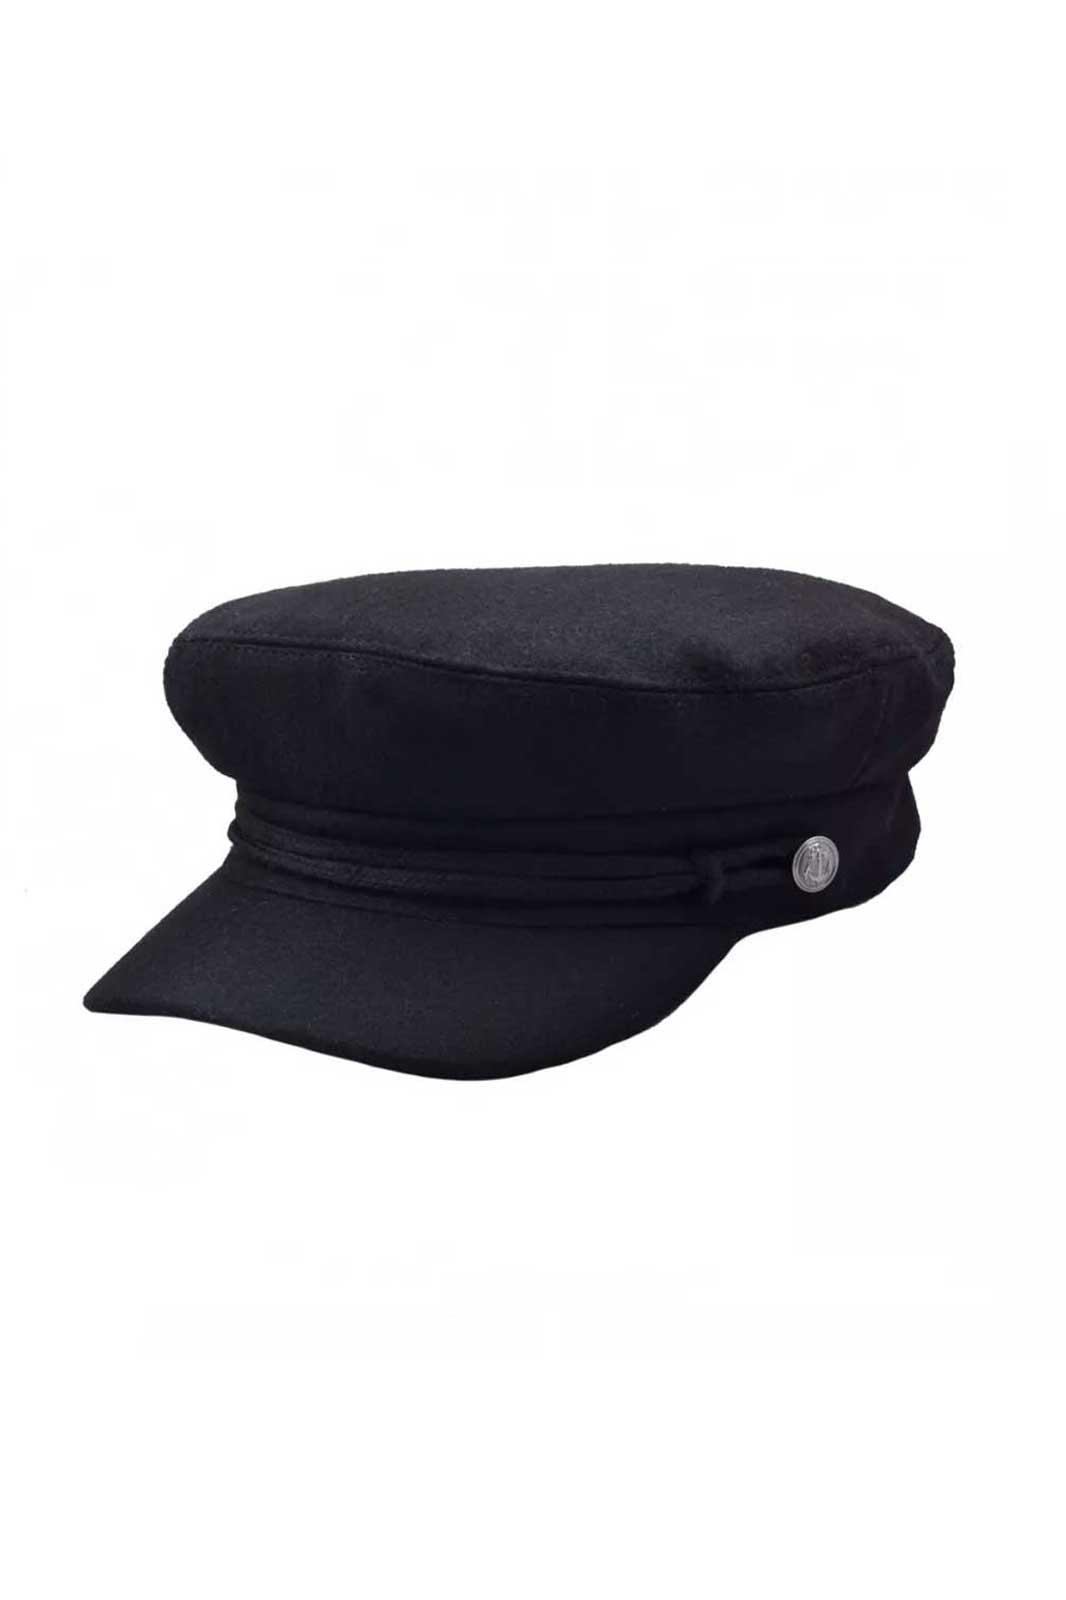 G&H Fiddler Cap Black